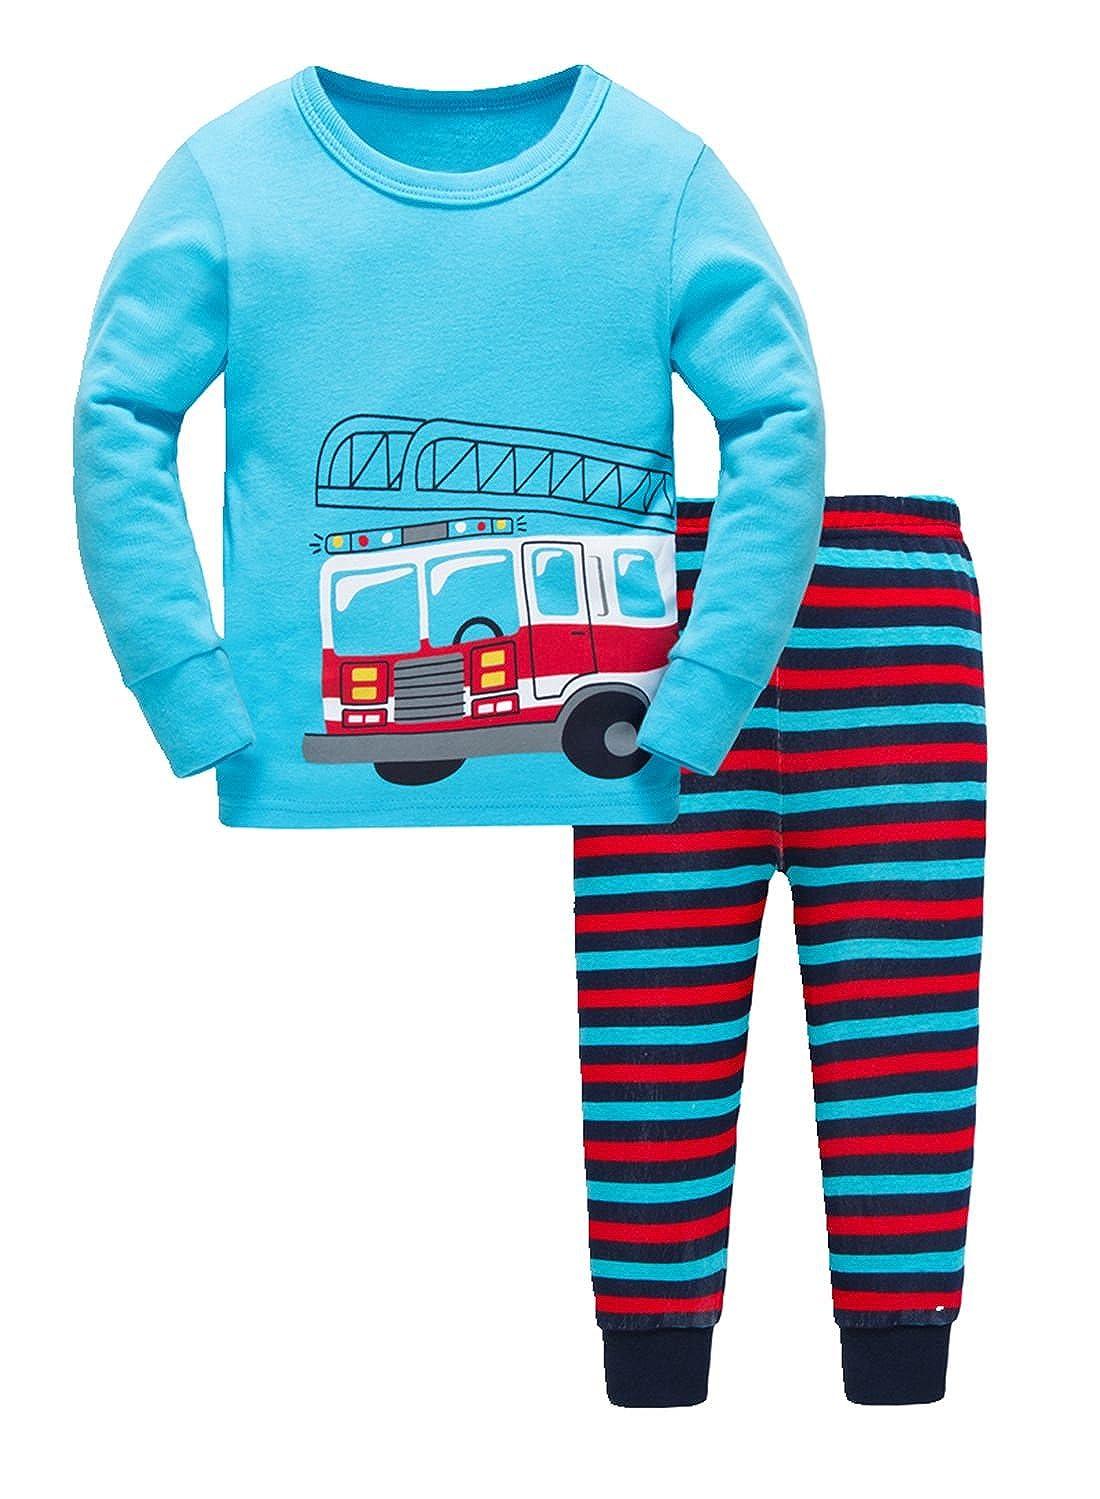 Boys Pajamas Comfort Long Sleeves Toddler Clothes Bus Kids Pjs Sleepwear 2 Piece Yzjcafriz